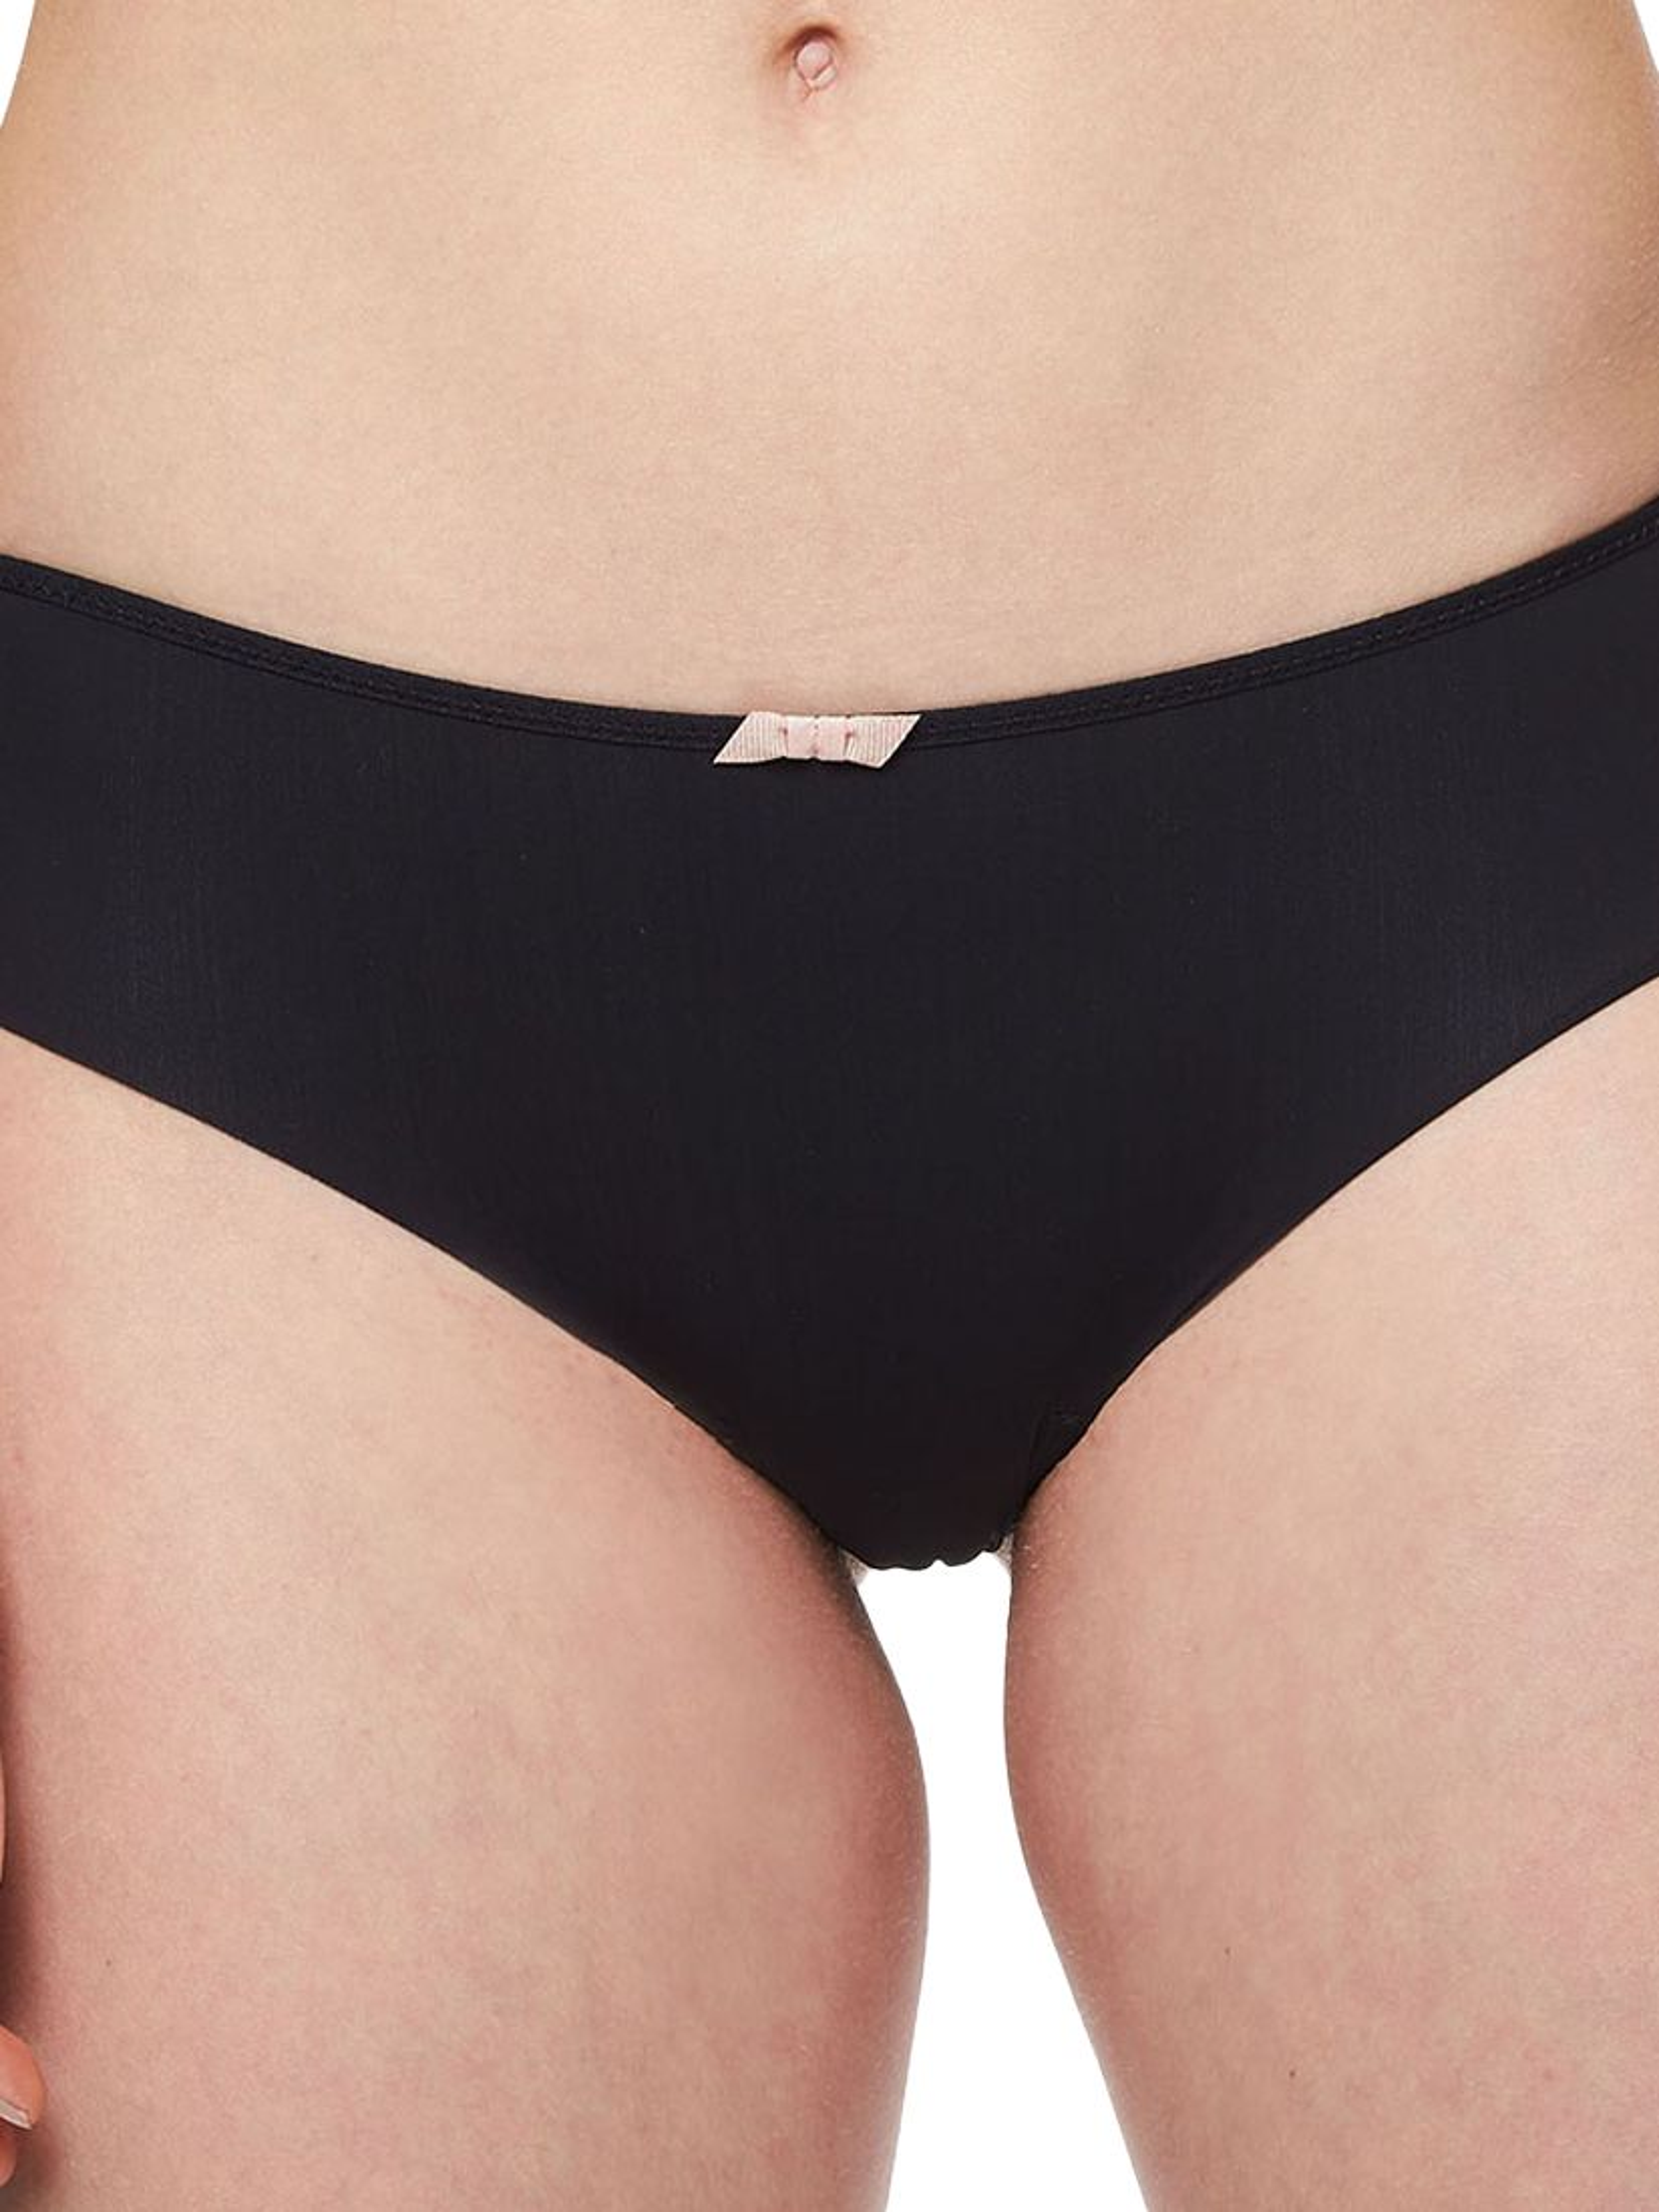 Passionata Passionata Georgia Hipster Briefs, Black